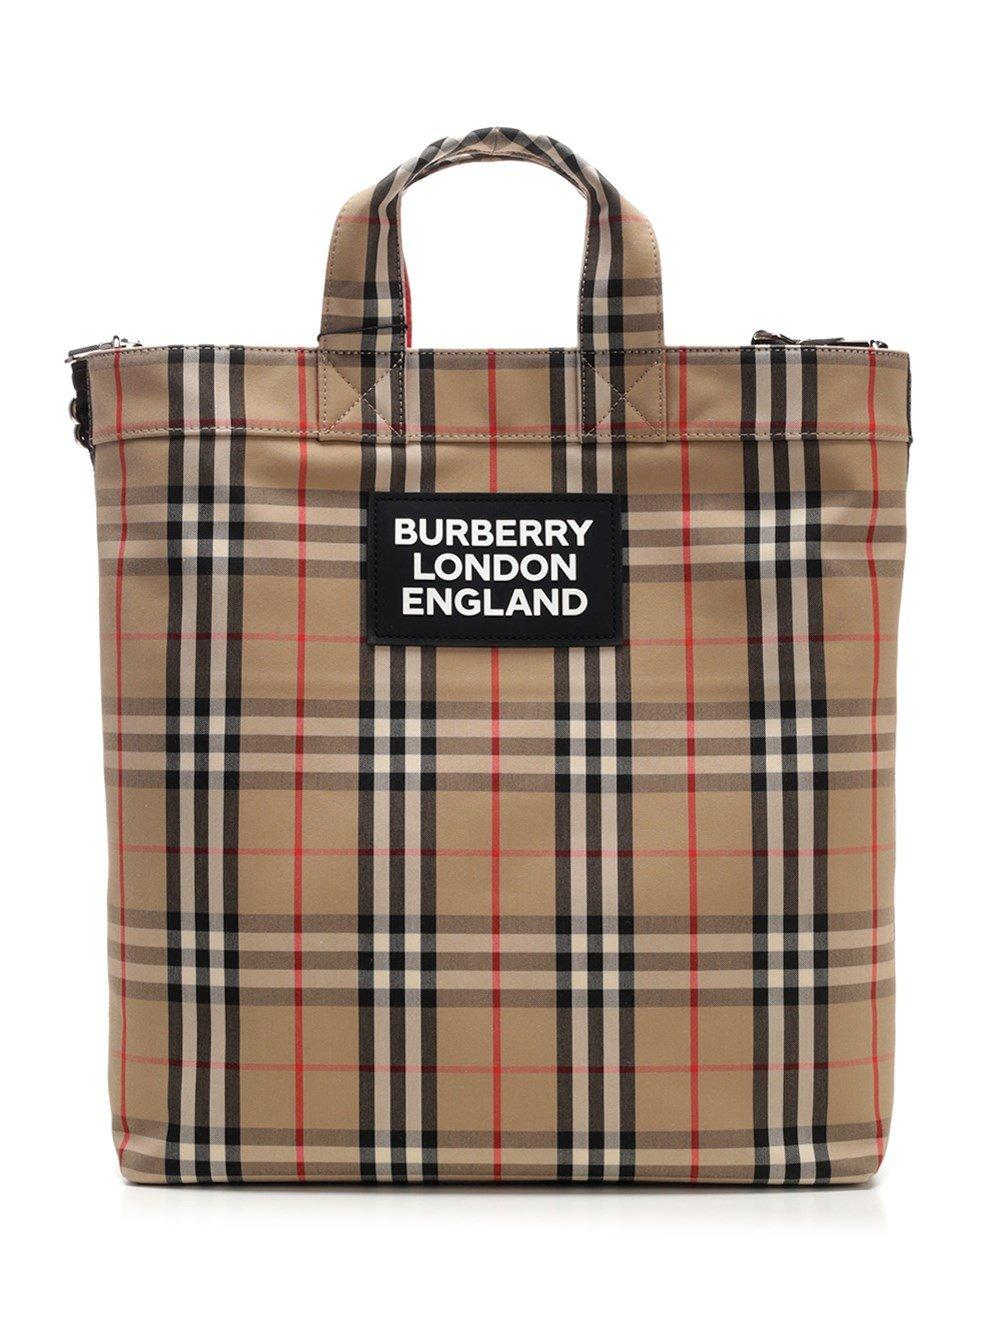 Shopping Trolley Wheel Bag Pattern Tartan Striped Check Strong Large Light